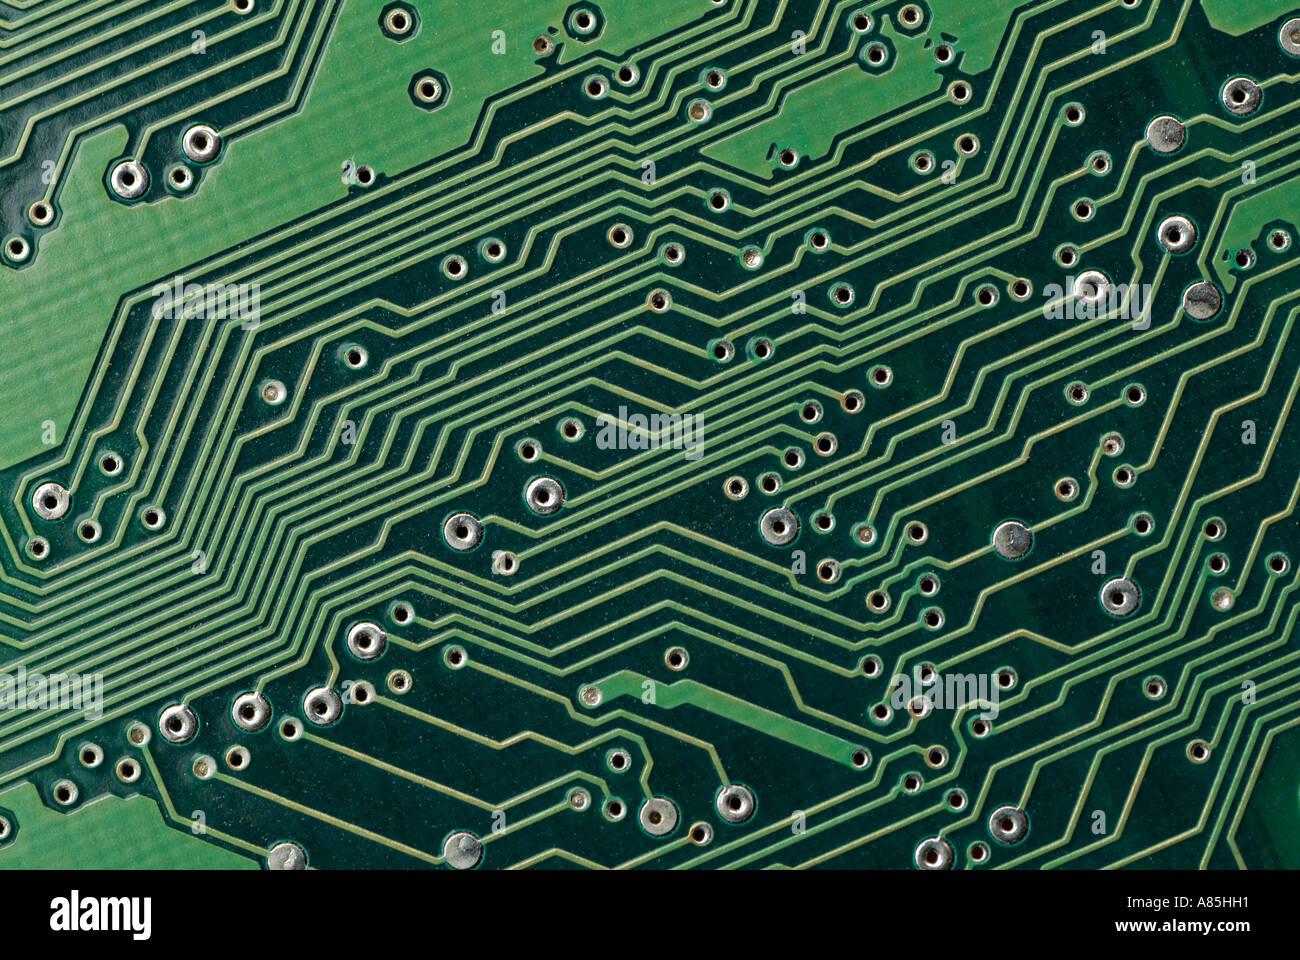 Elektronischen Leiterplatte Stockbild